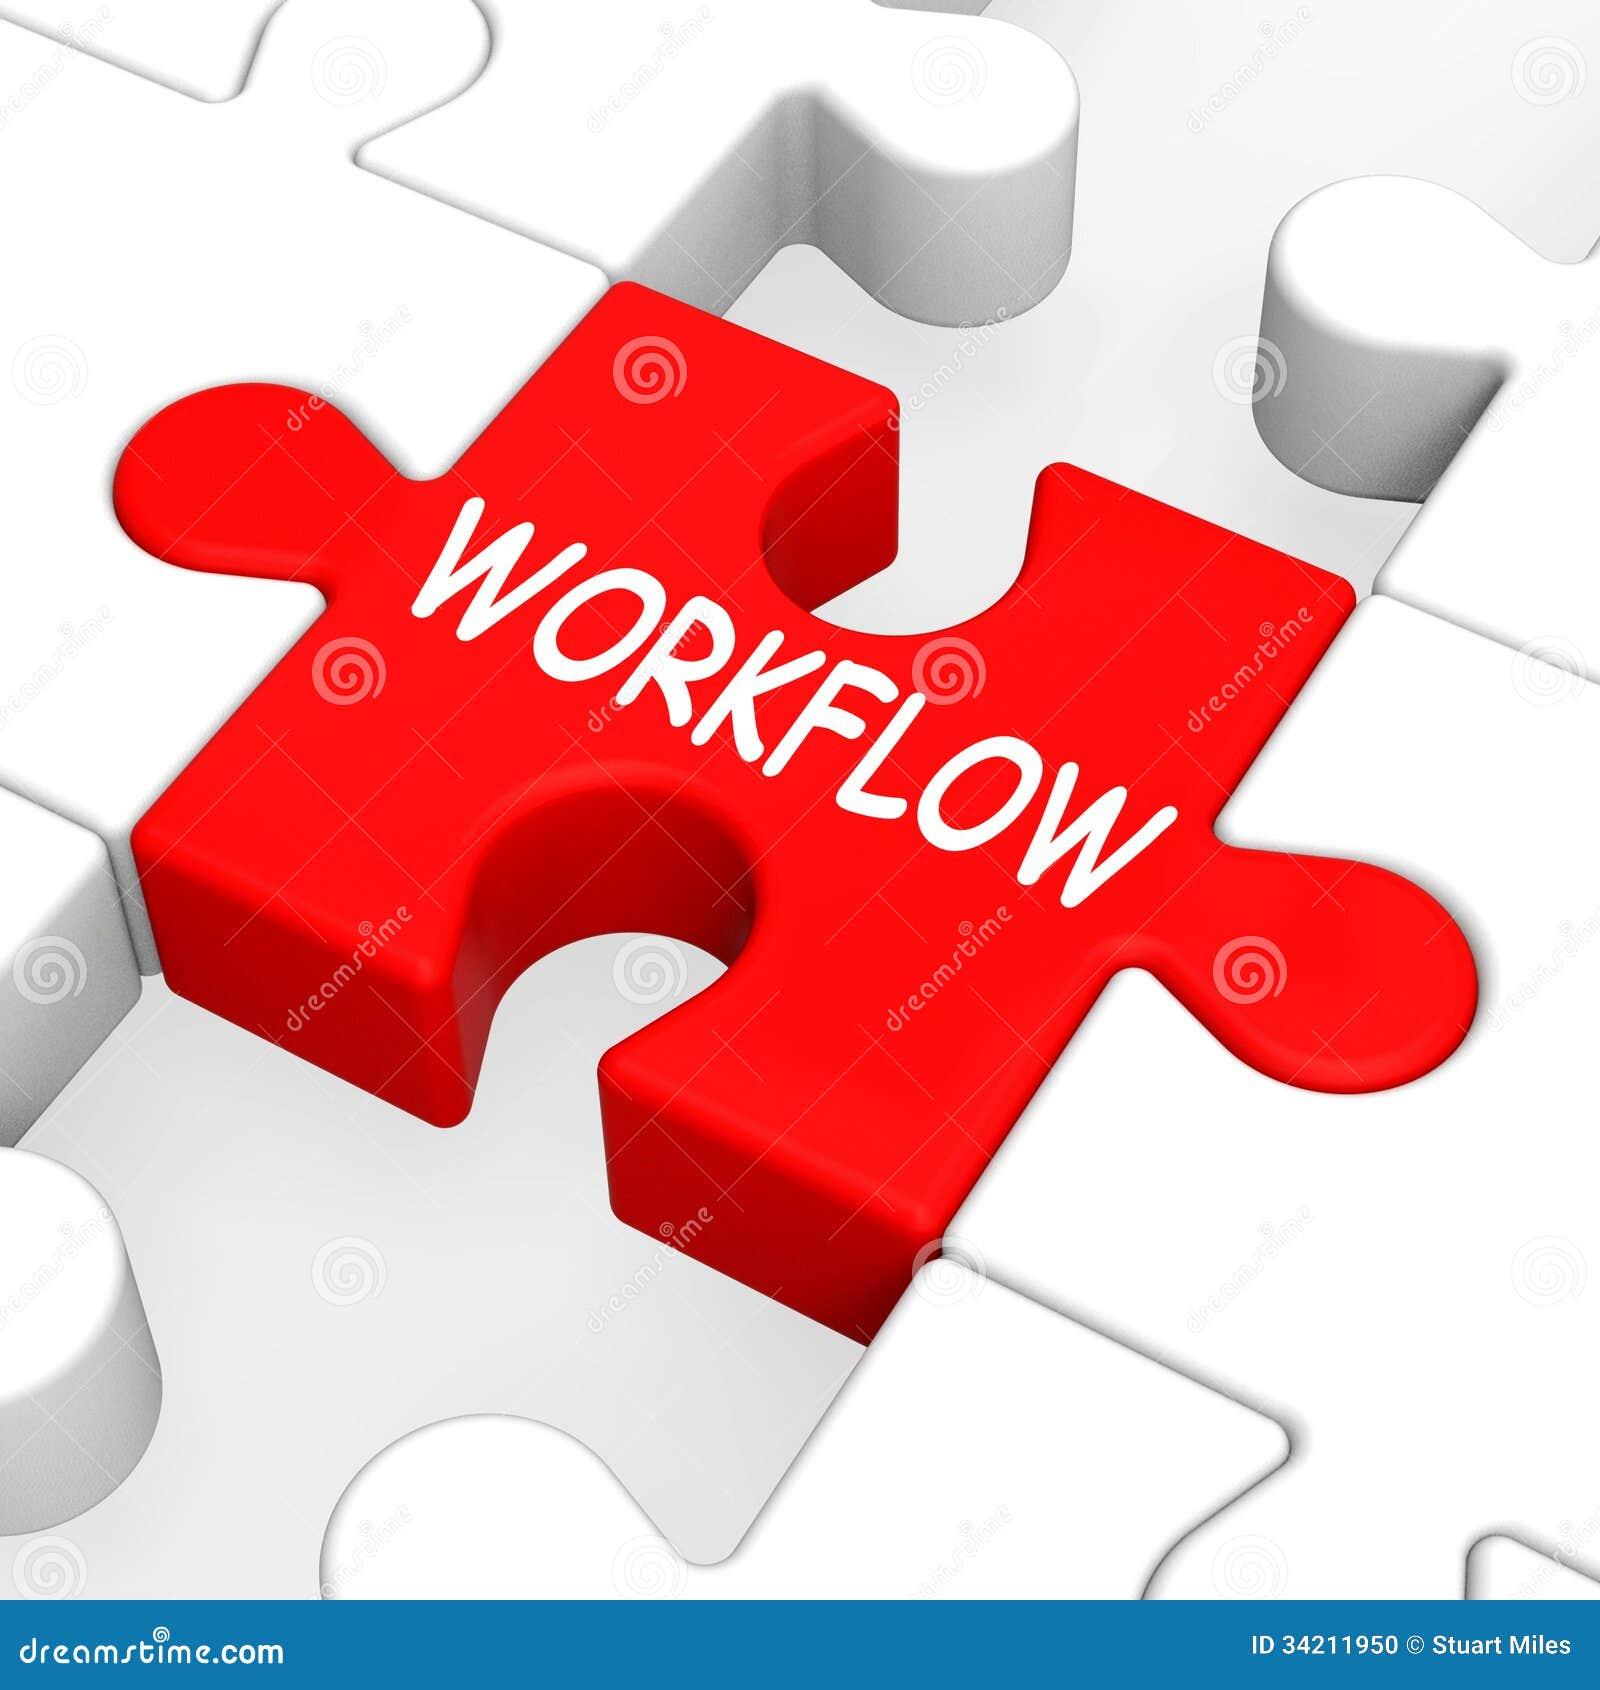 workflow puzzle shows process flow or procedure stock